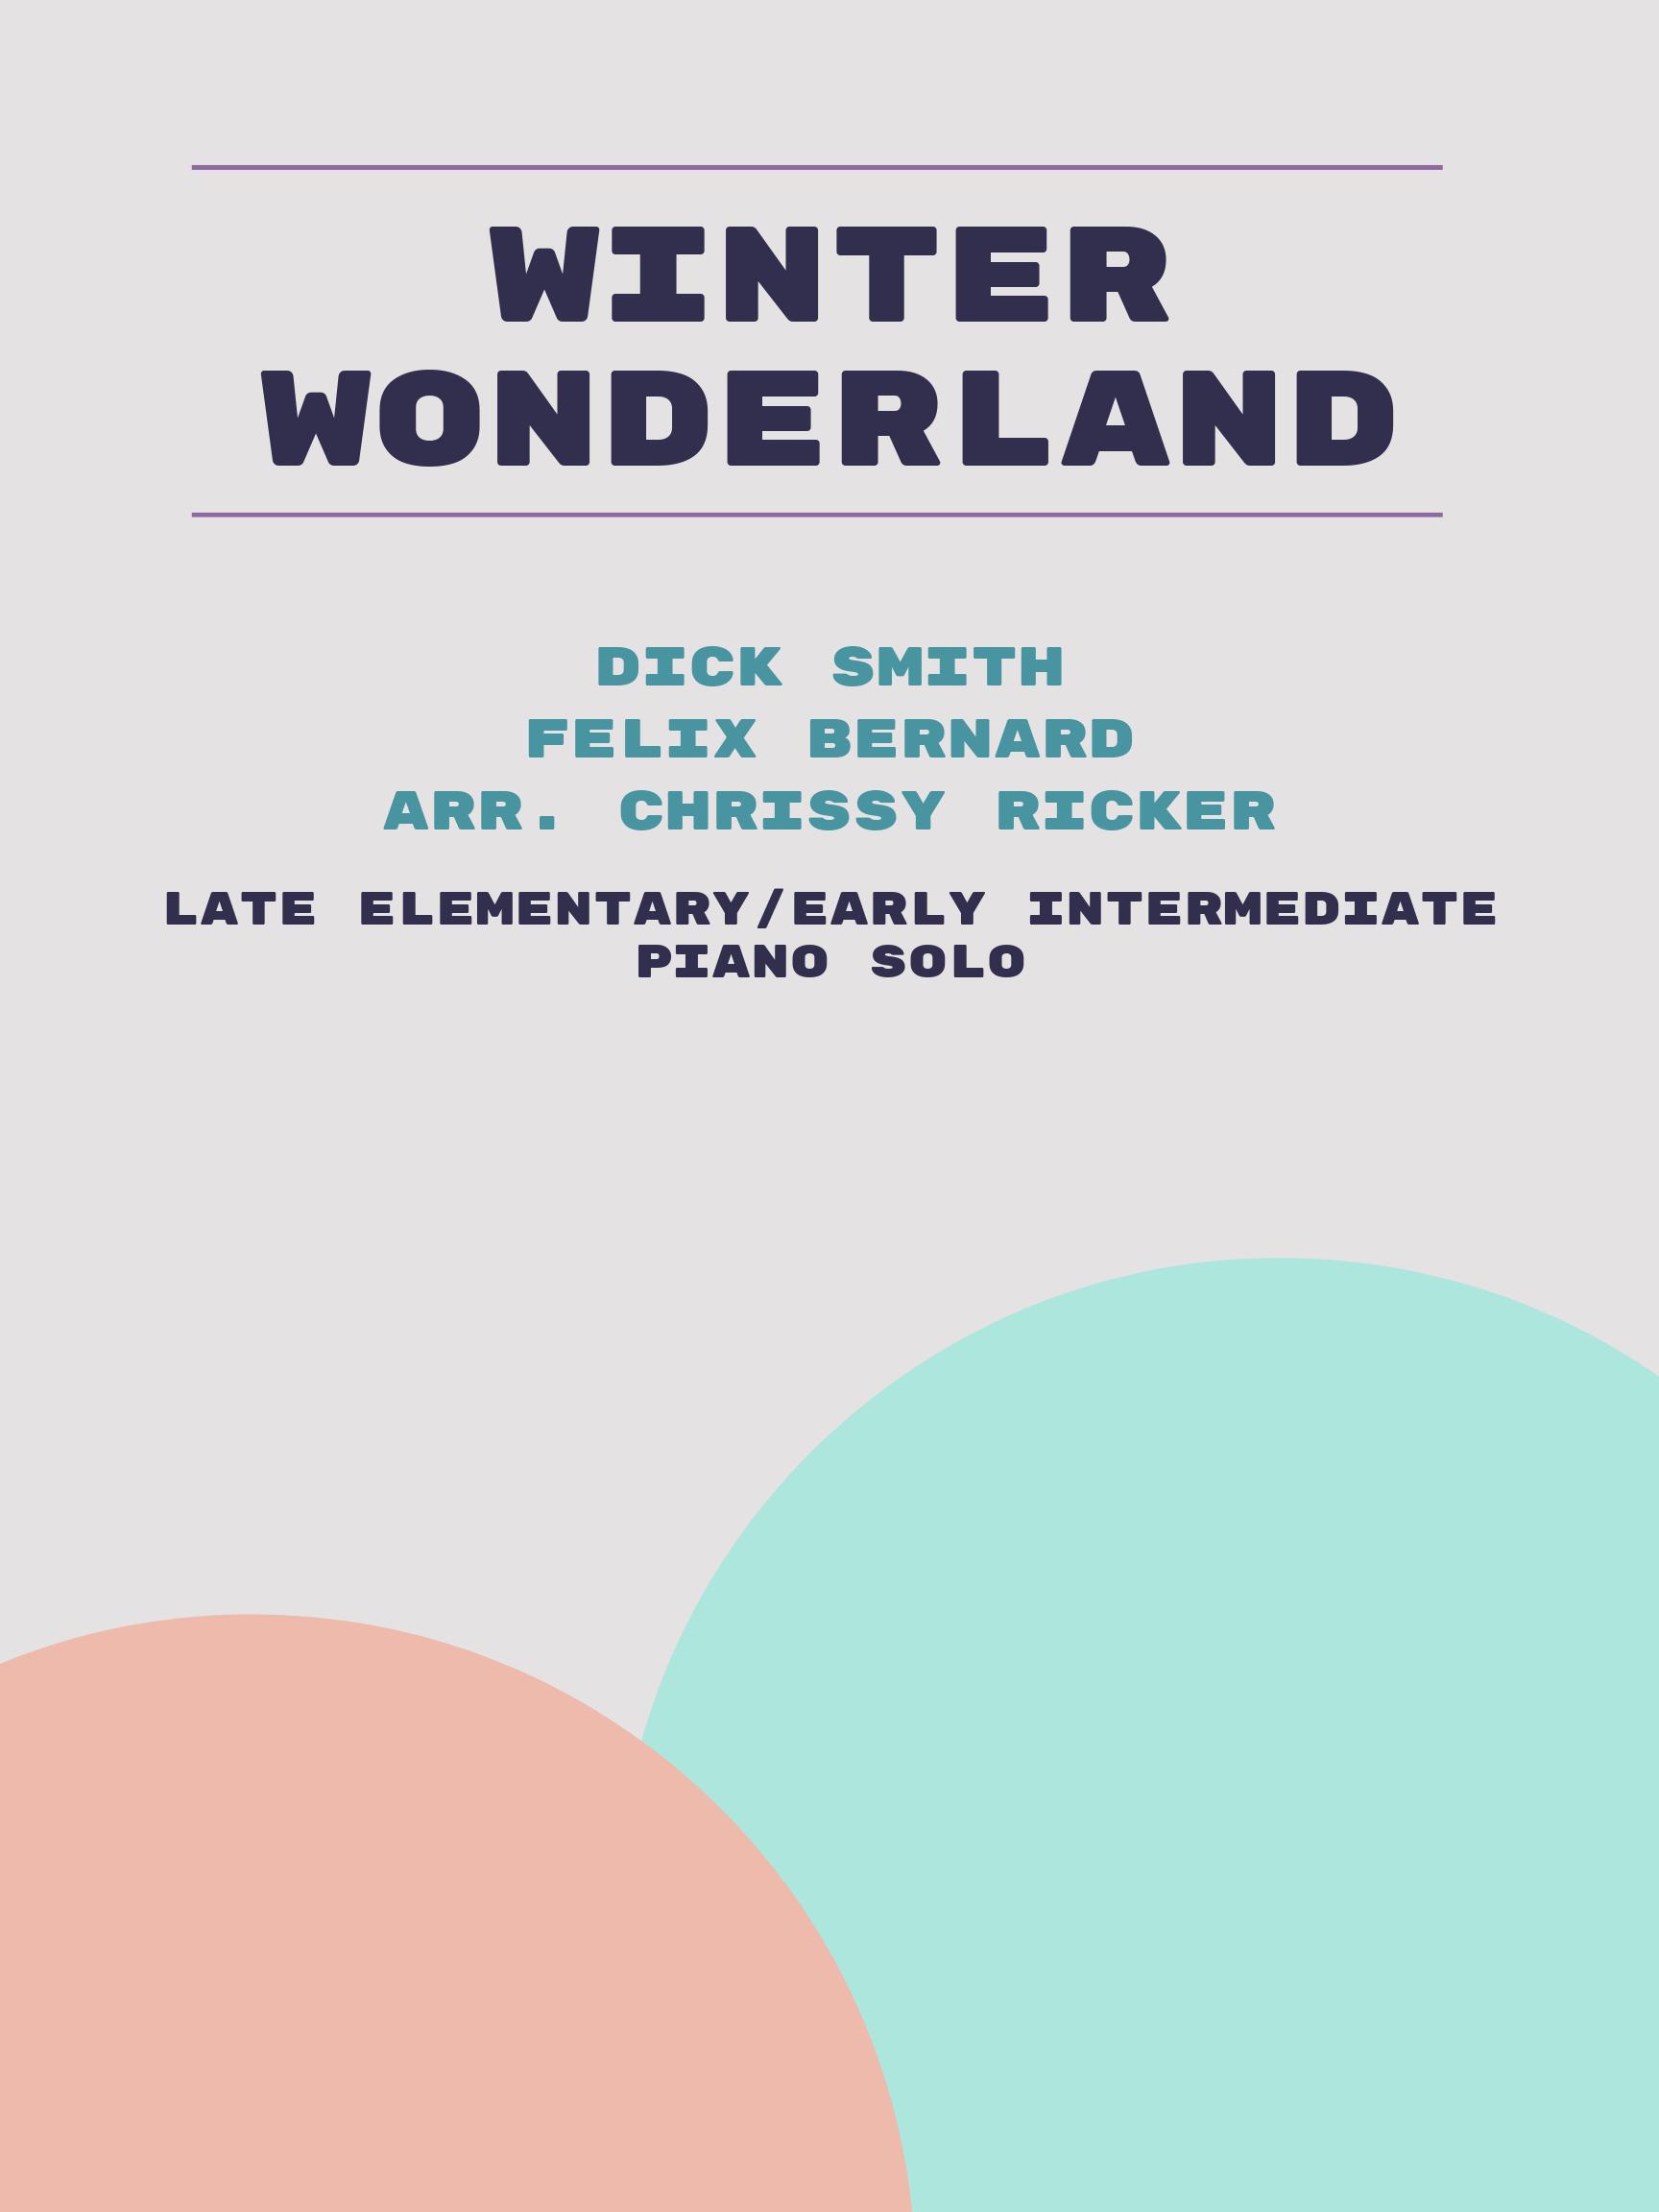 Winter Wonderland by Dick Smith, Felix Bernard